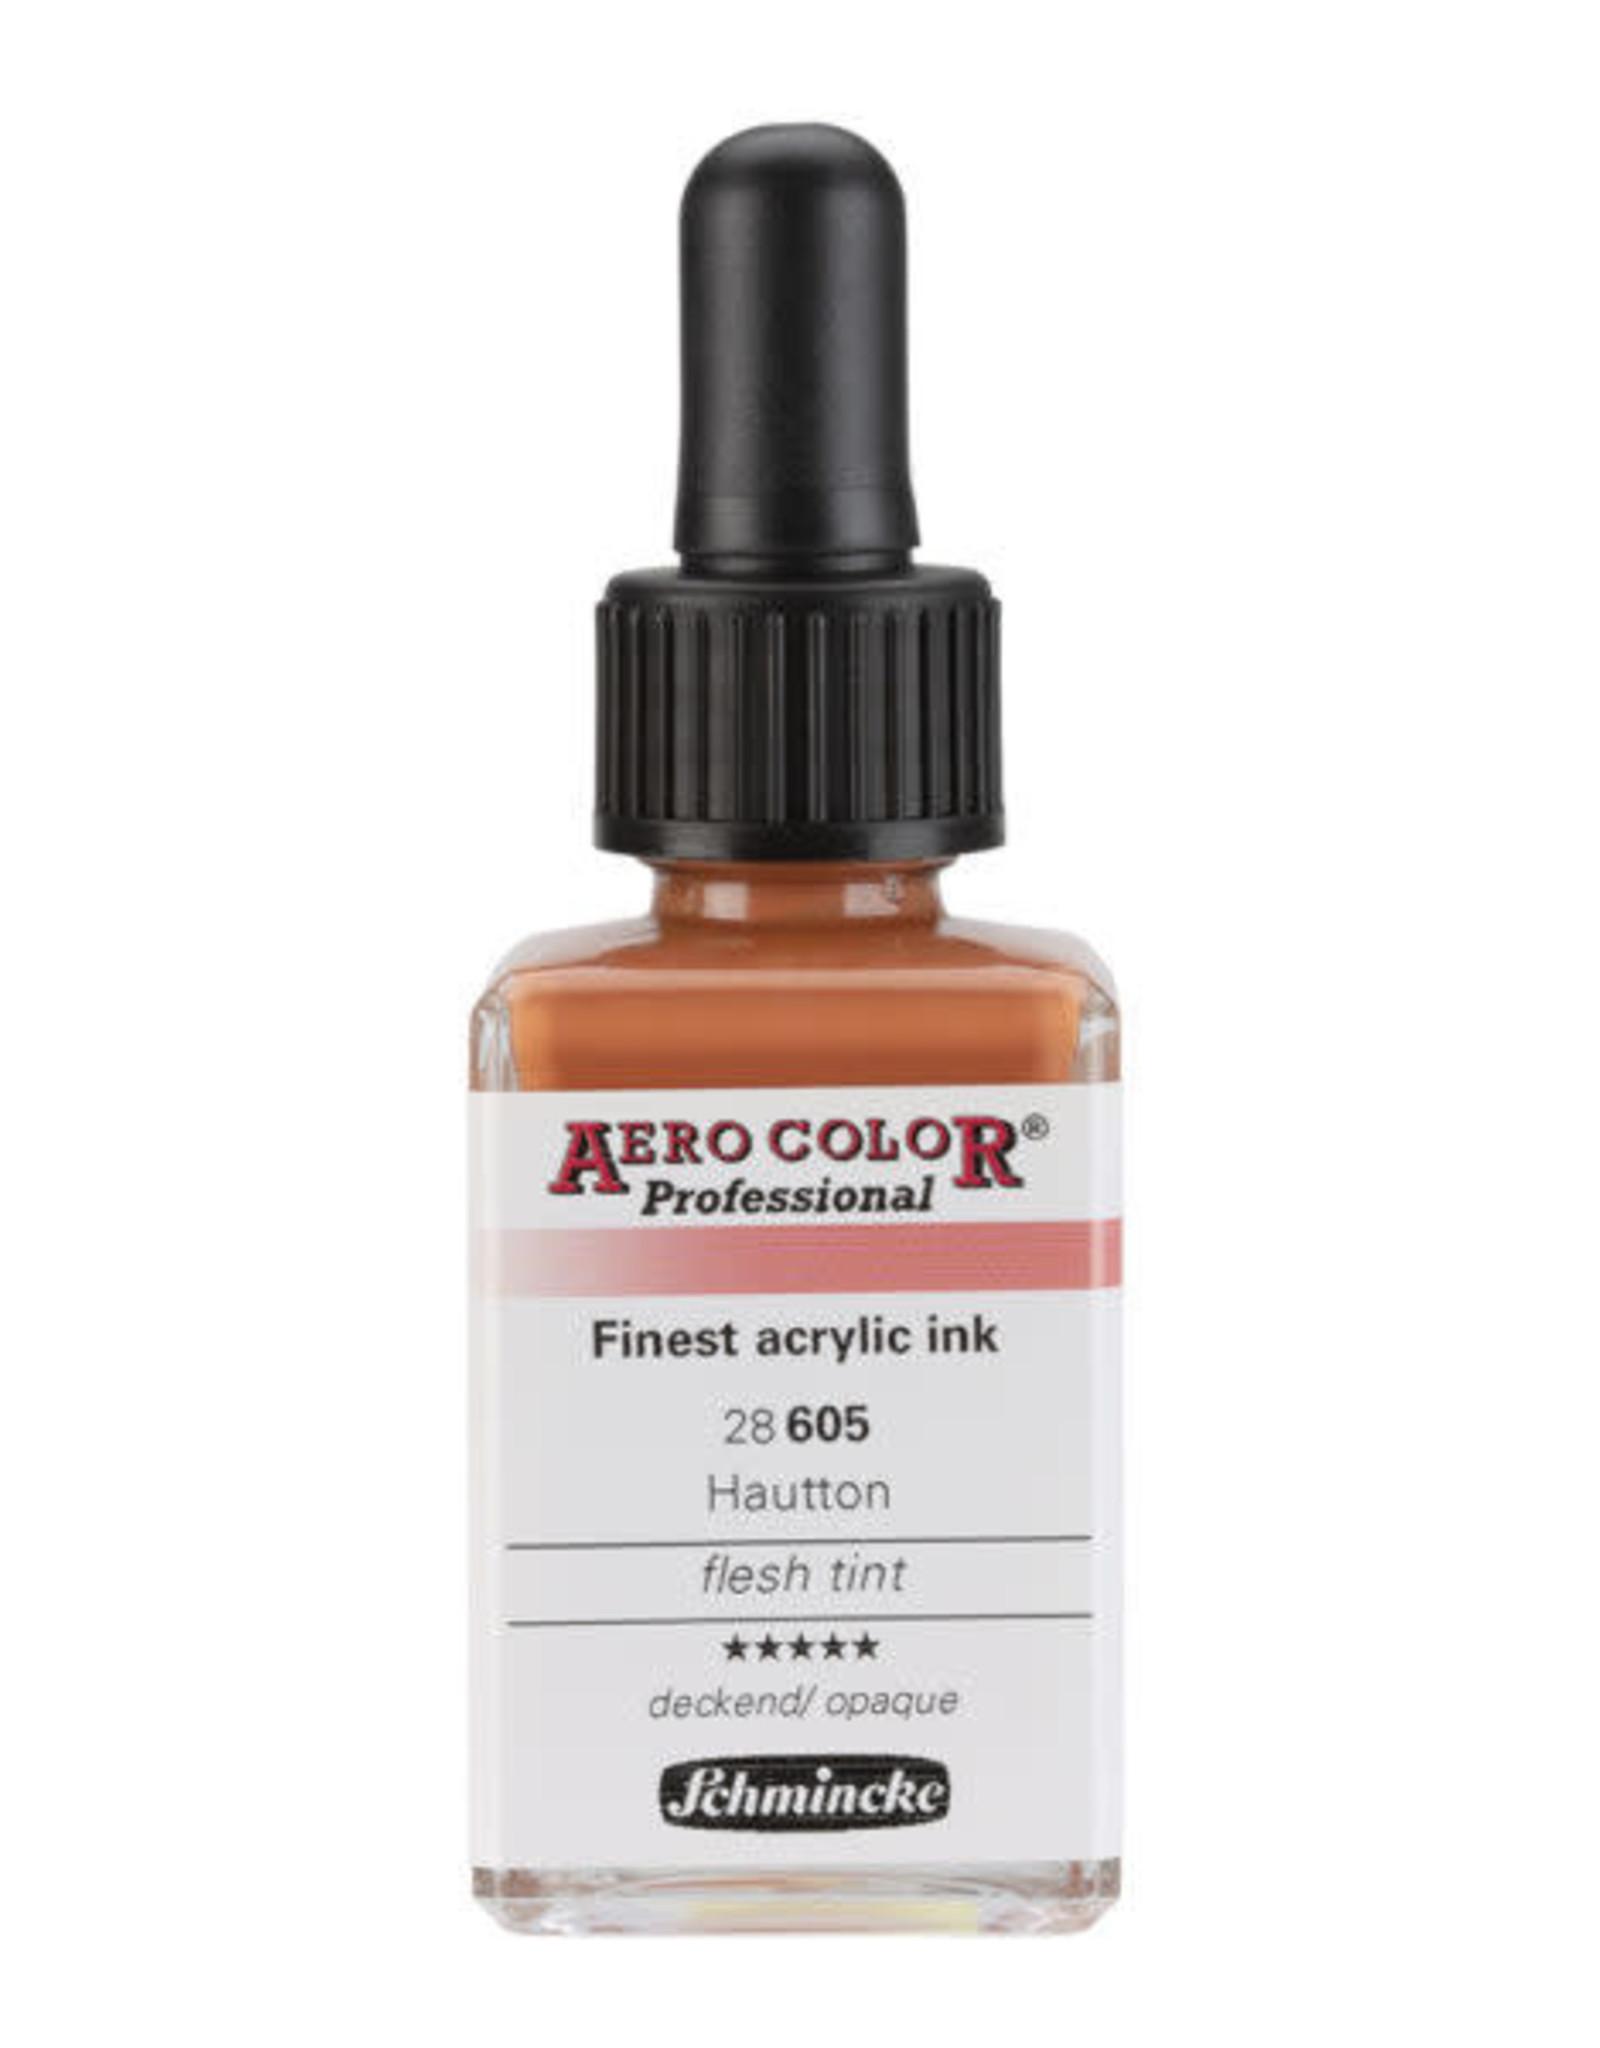 Schmincke Aero Color Flesh Tint